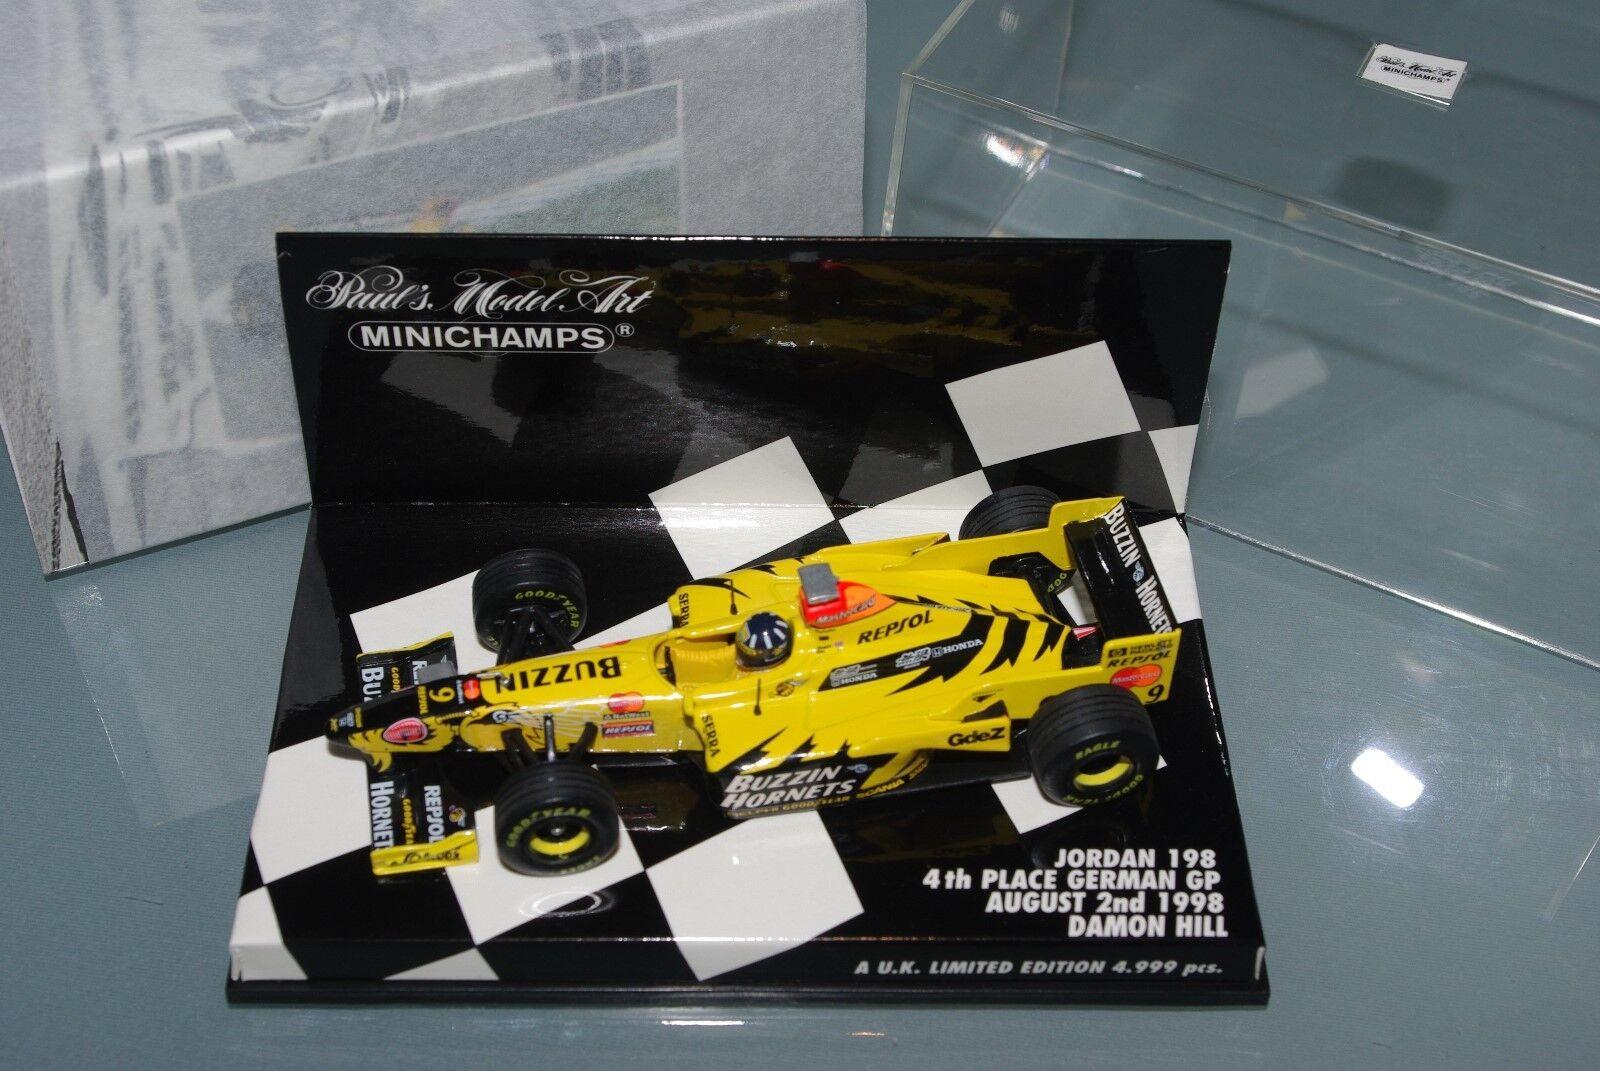 Minichamps F1 1 43 Jordan 198-Damon Hill - 4th Place German GP 1998-UK Ltded